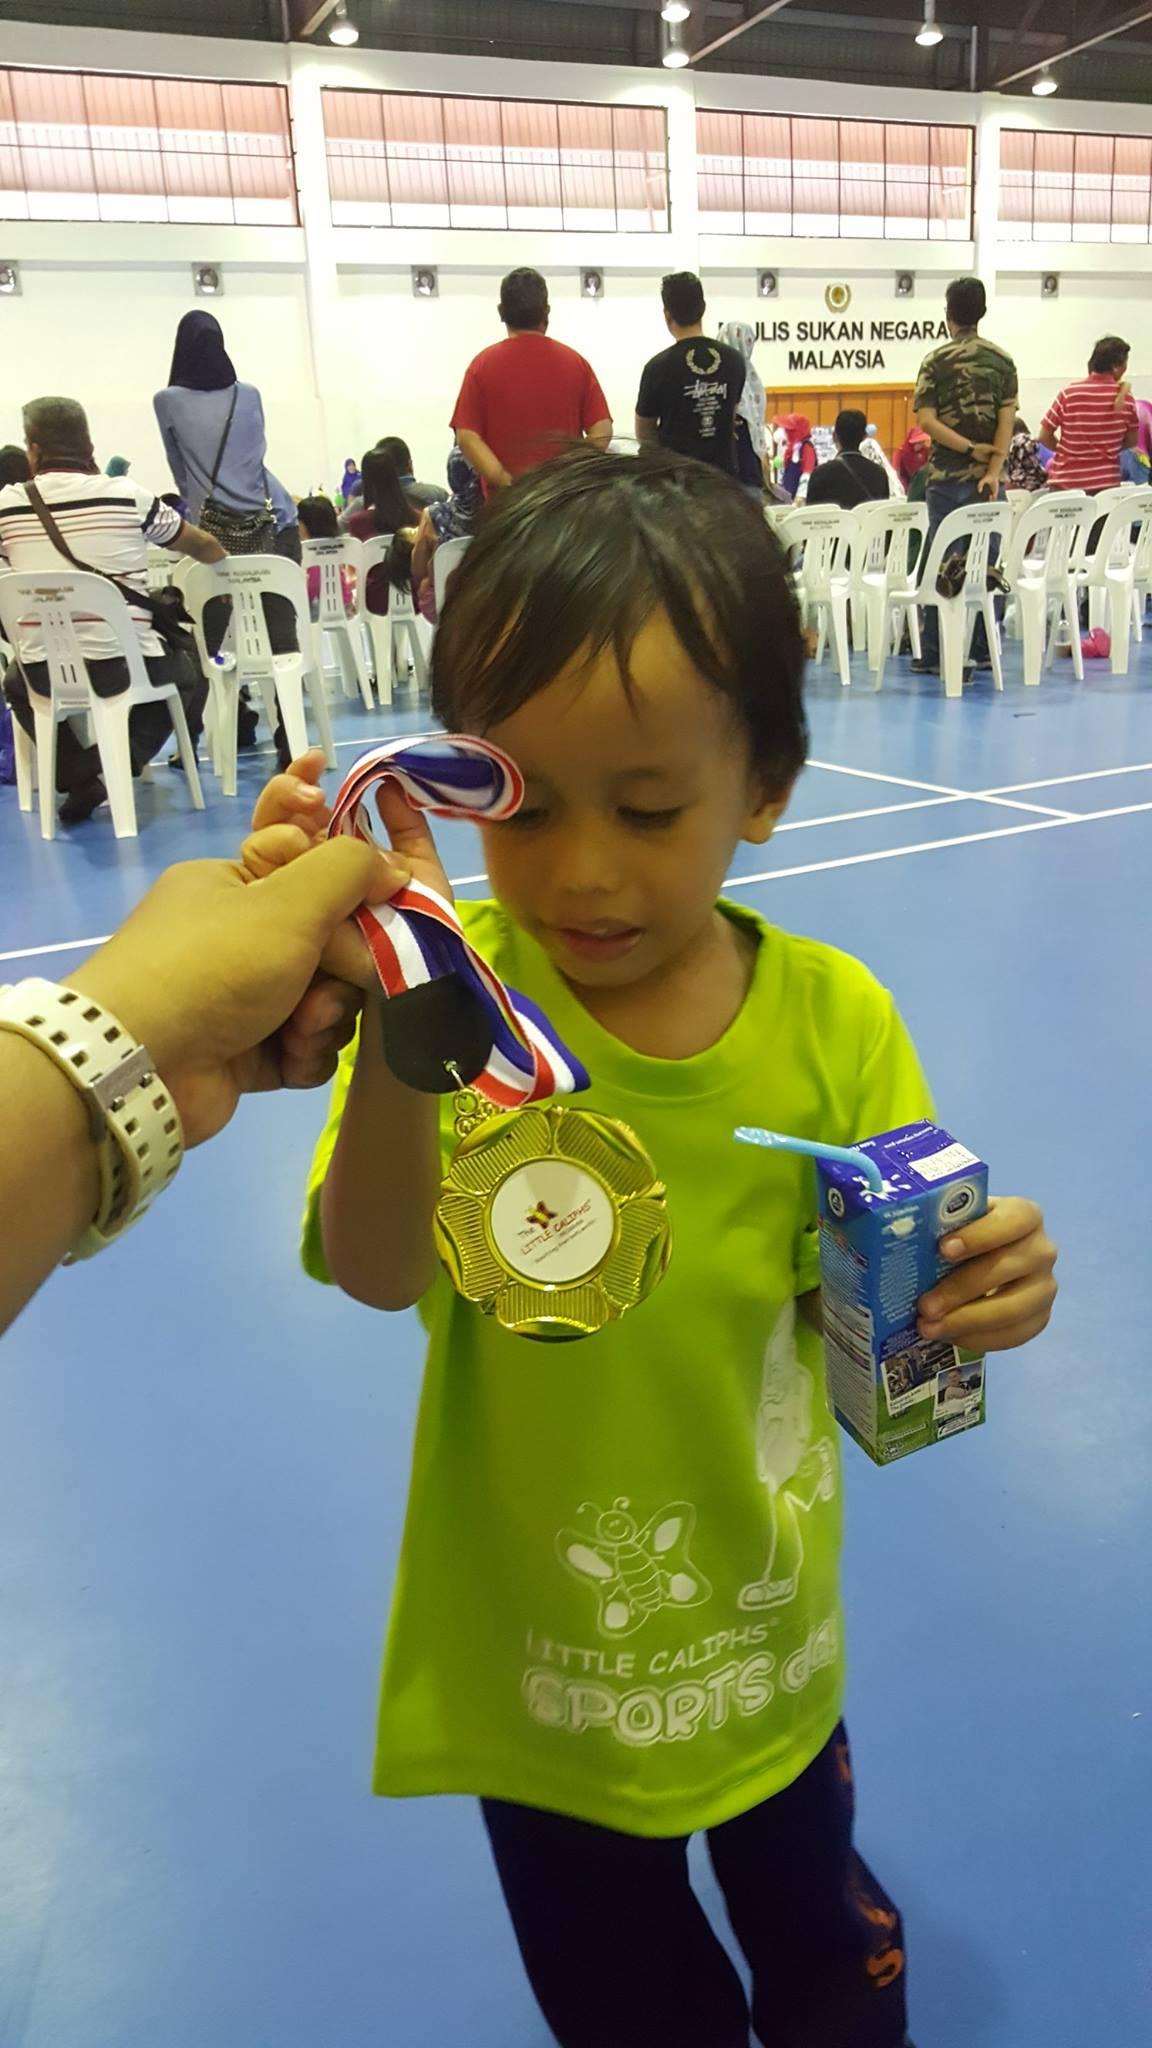 sports-day-little-caliph-2016 (4)